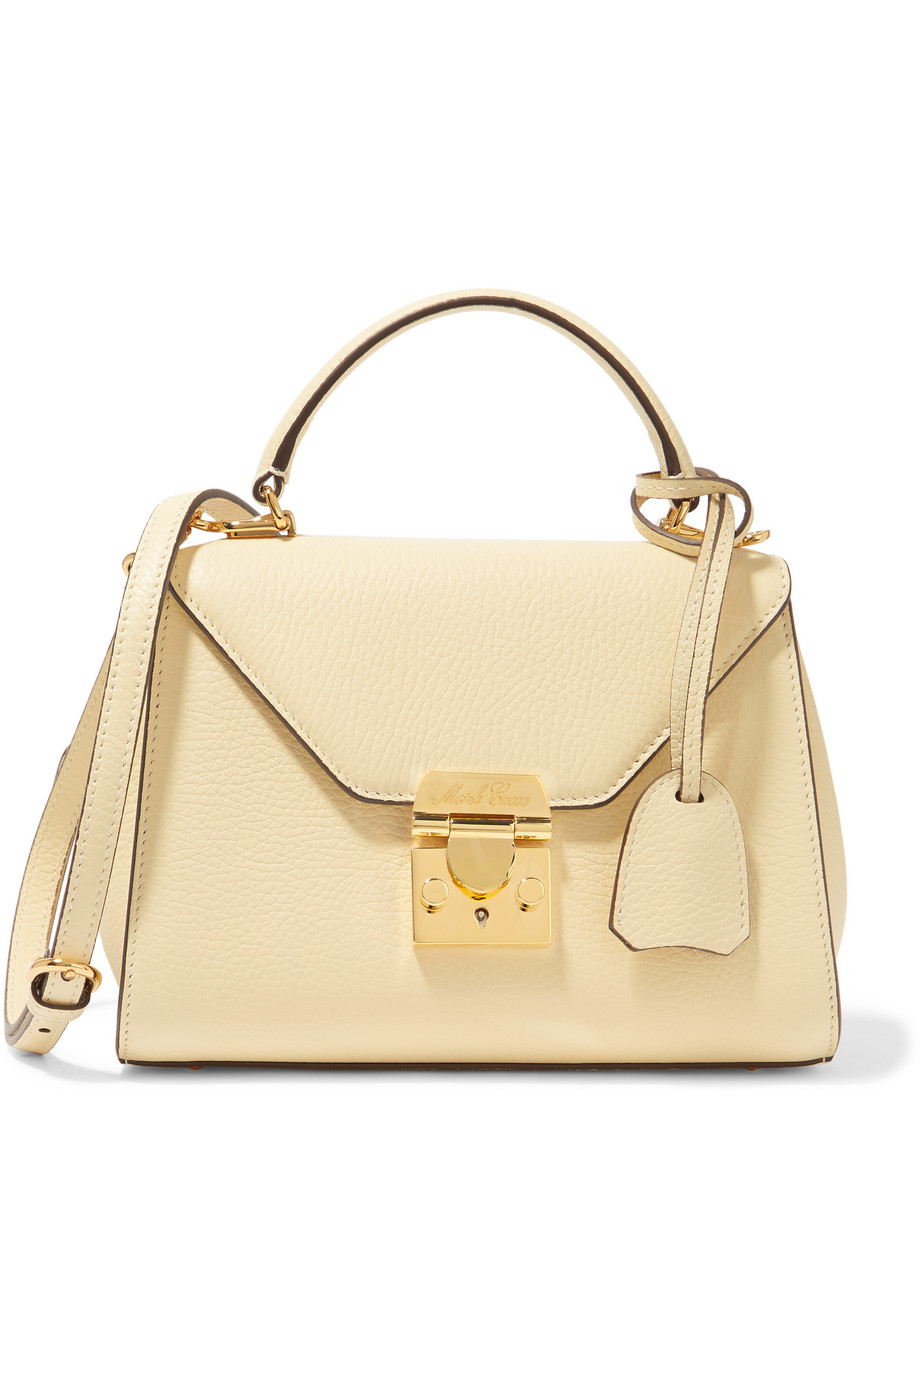 Mark Cross Hadley Baby Textured-Leather Shoulder Bag, Cream, Women's